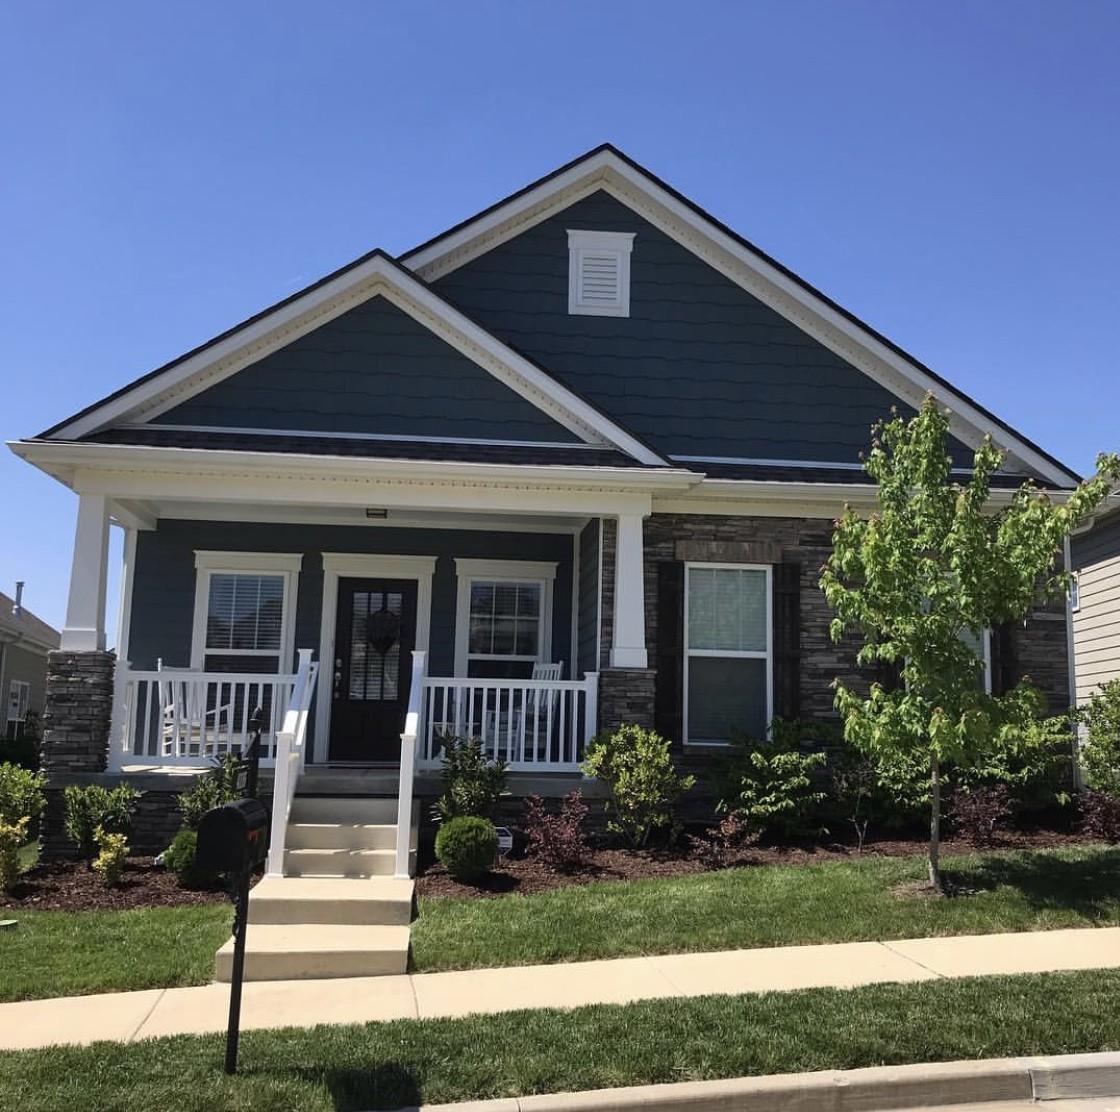 4116 Alva Ln Property Photo - Nolensville, TN real estate listing